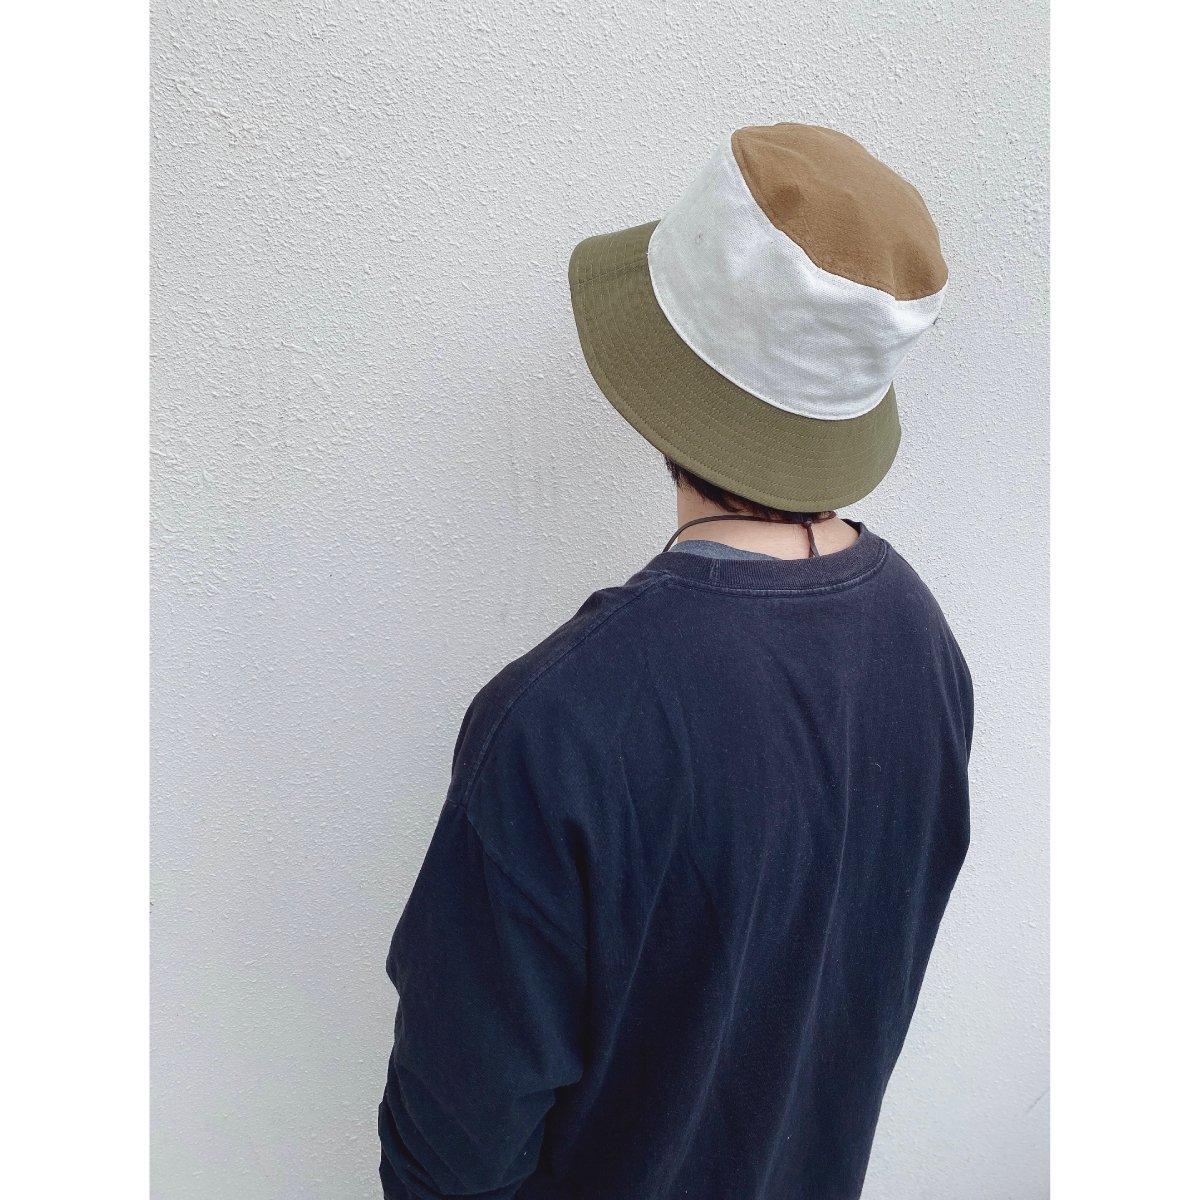 Repro Hat 詳細画像19